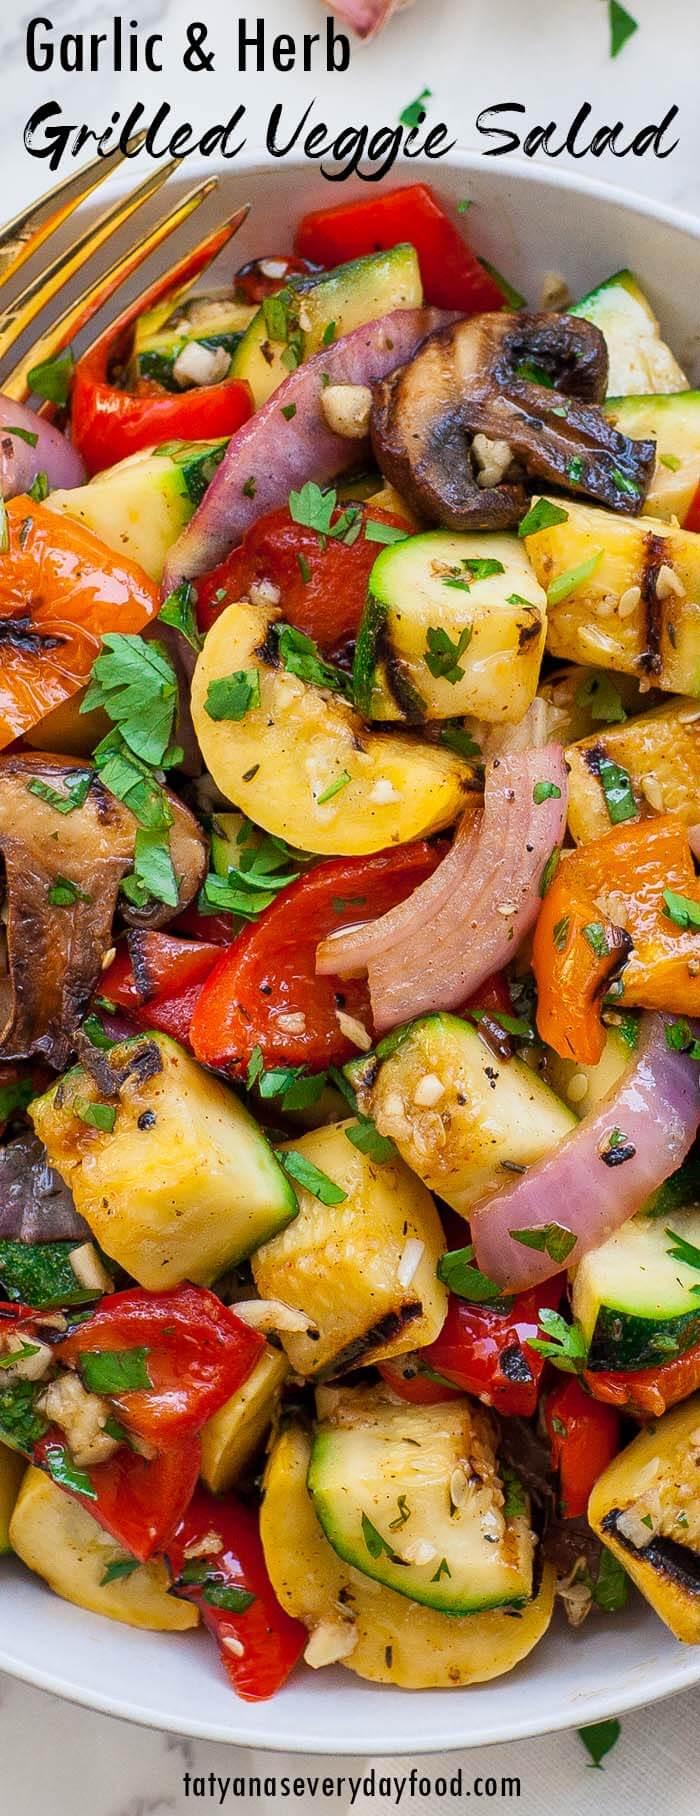 Garlic Grilled Veggie Salad video recipe